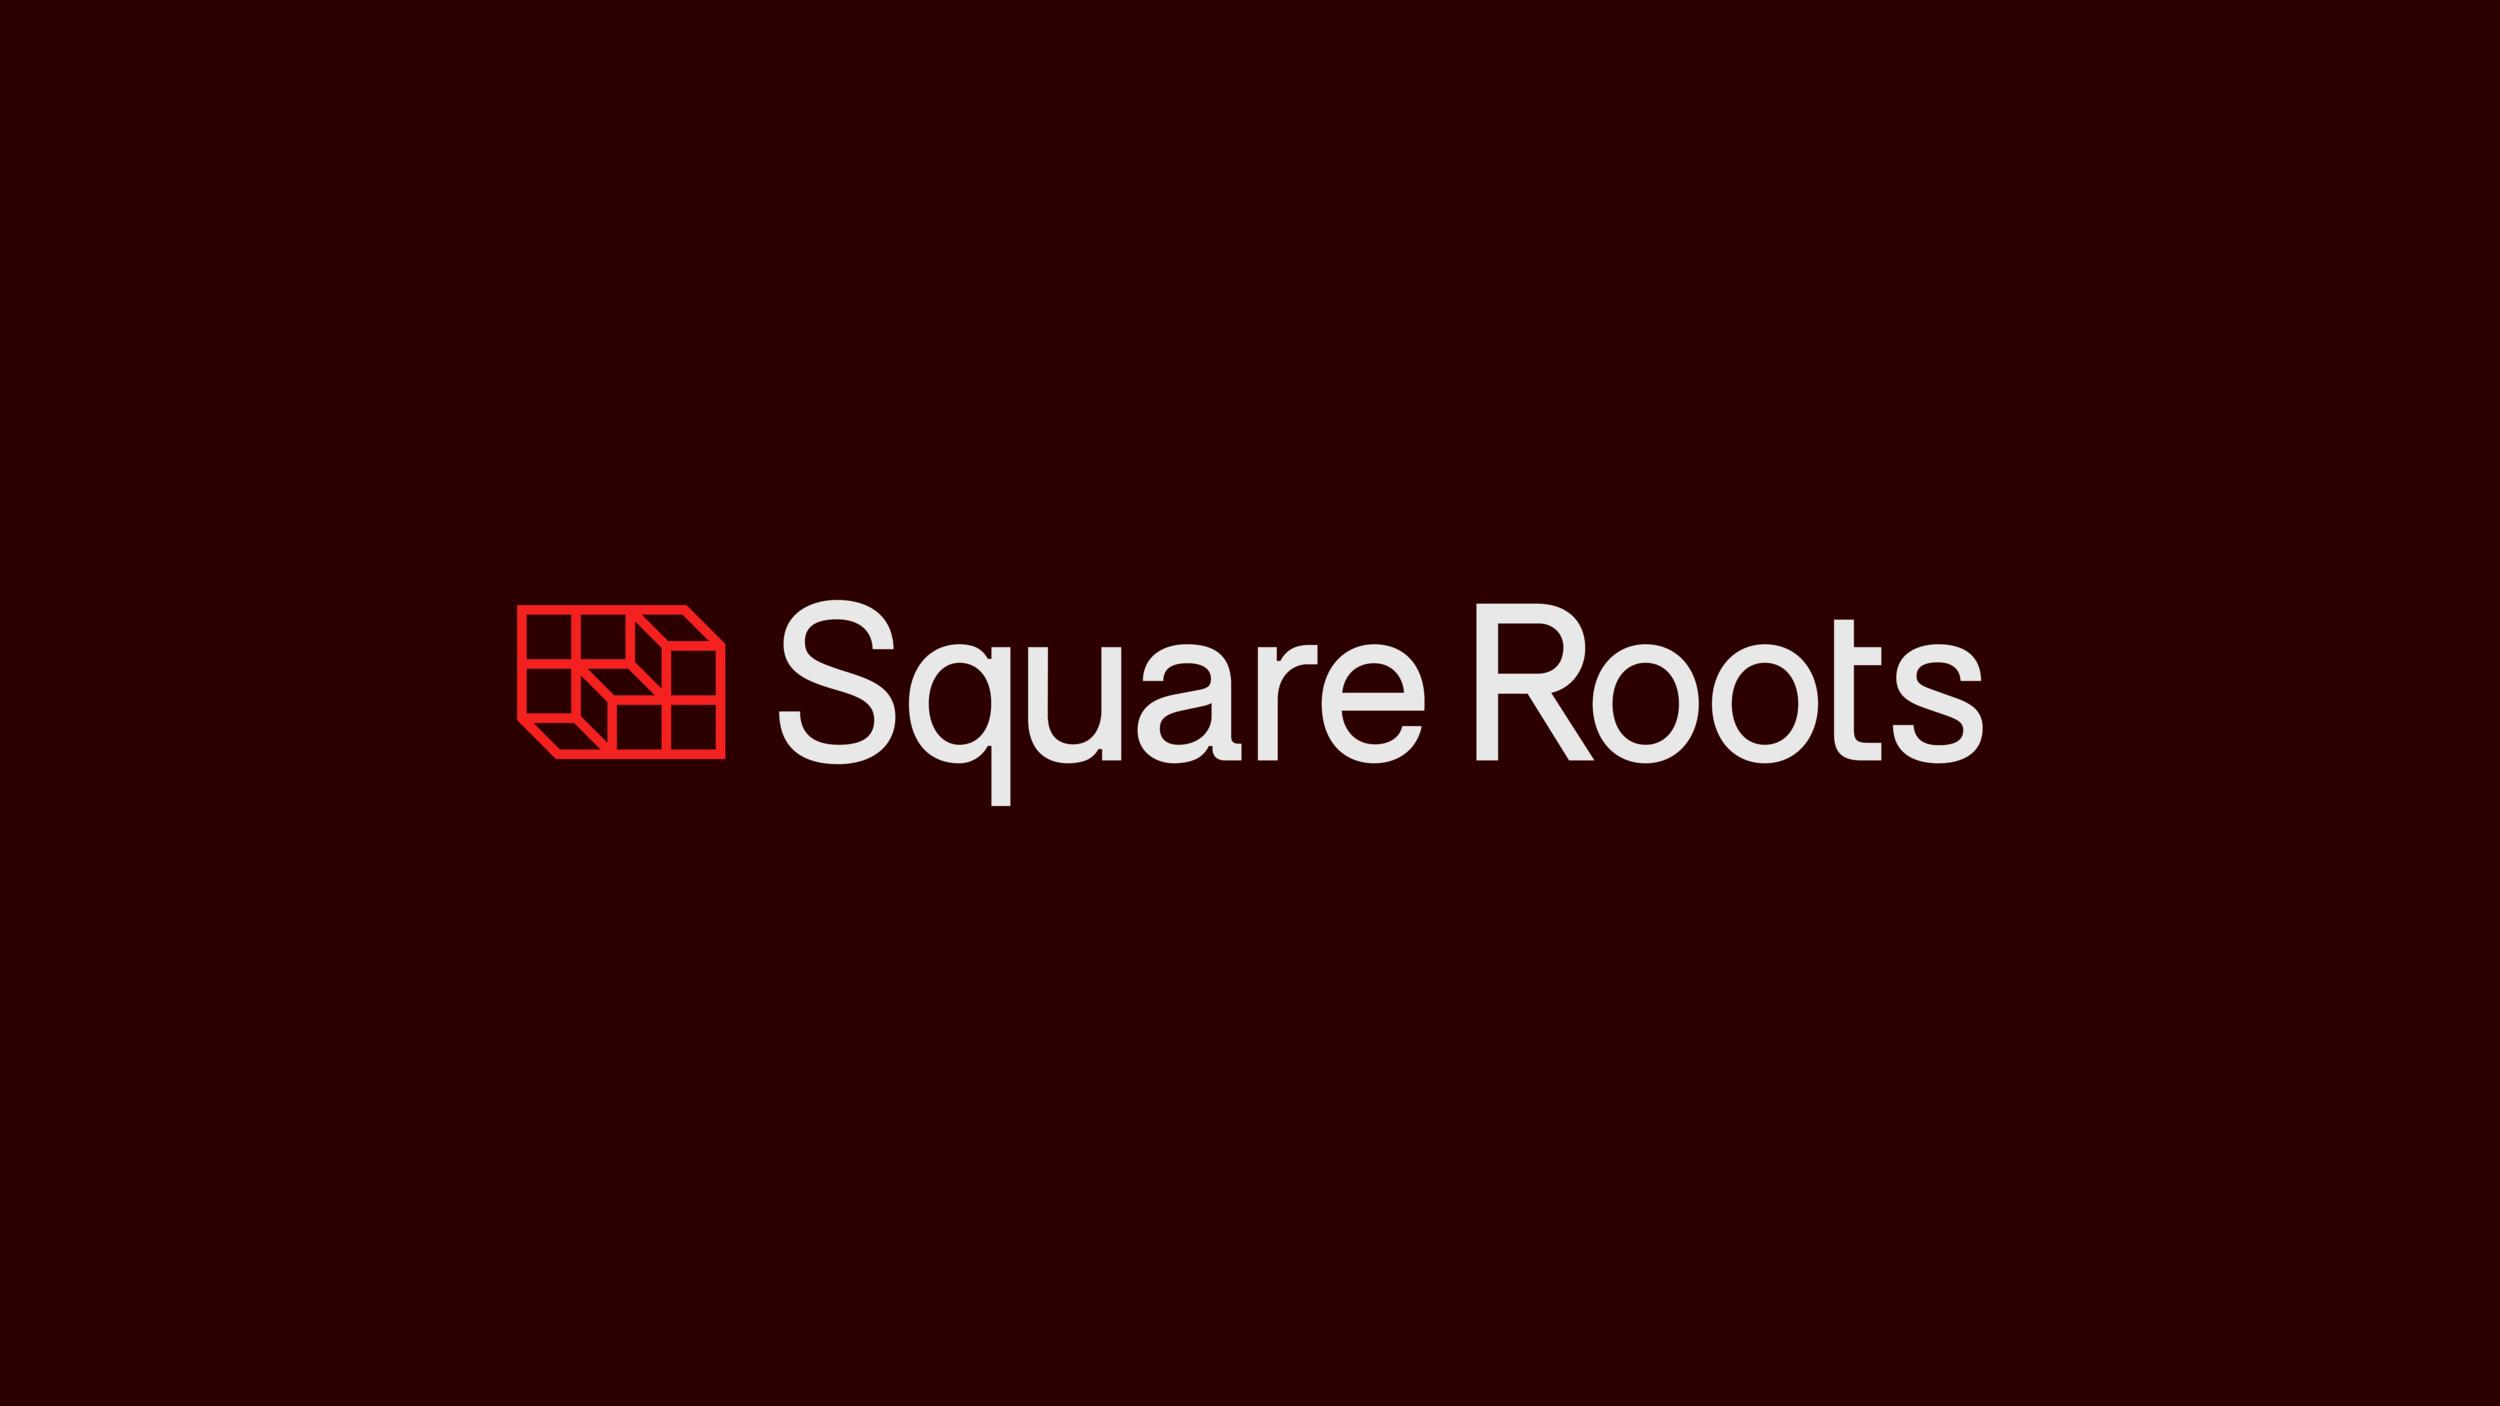 SquareRoots_V6_NS-01.png